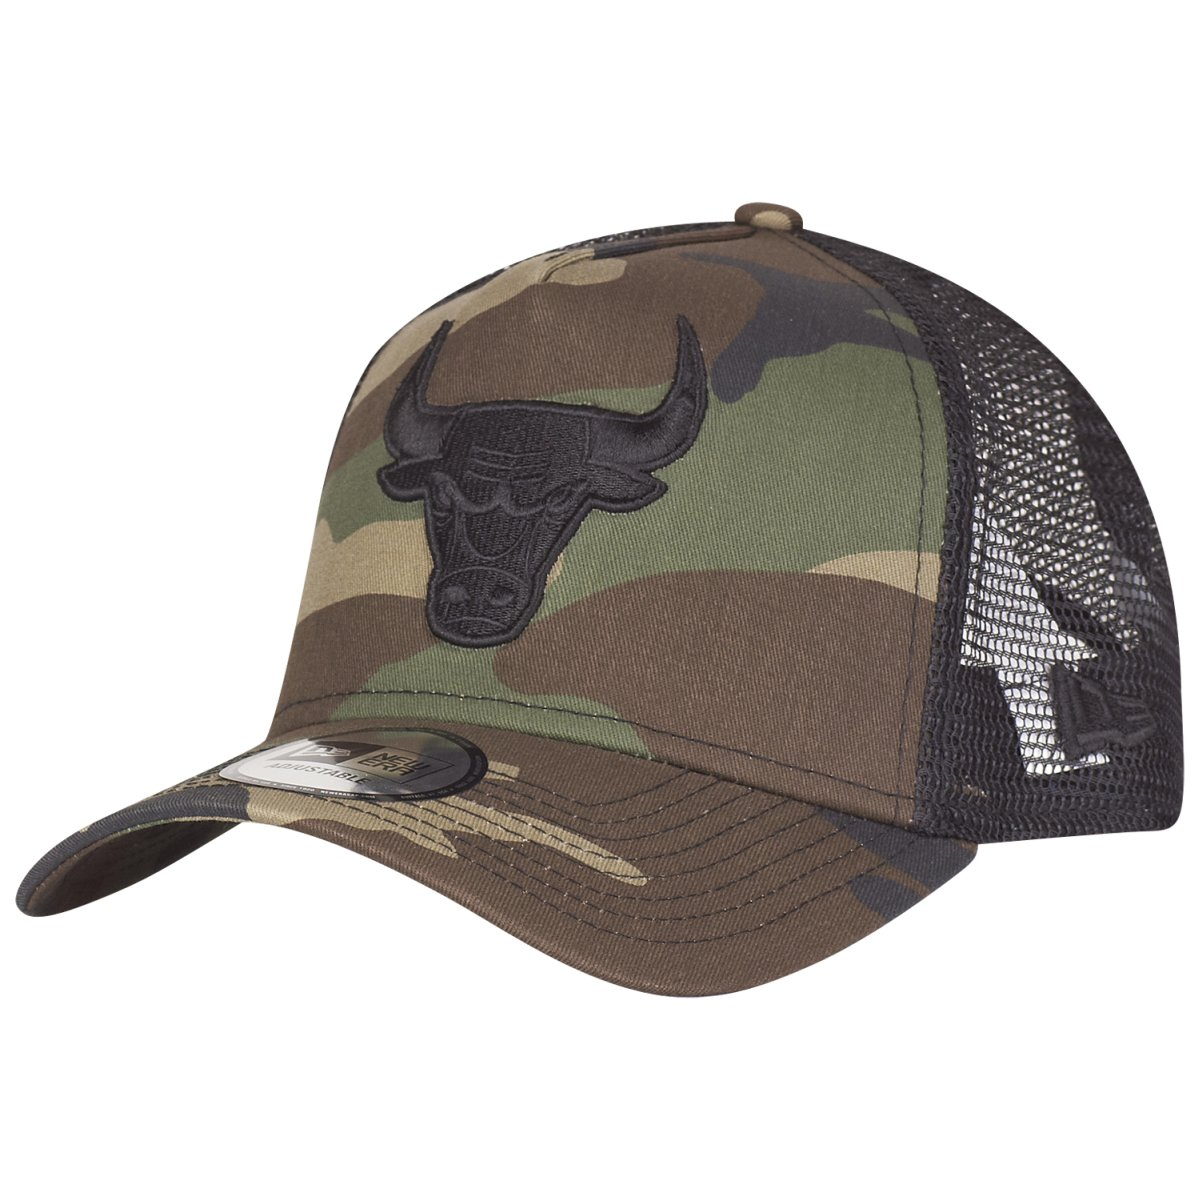 New Era Adjustable Trucker Cap - Chicago Bulls wood camo - One Size ... 53460736c2c